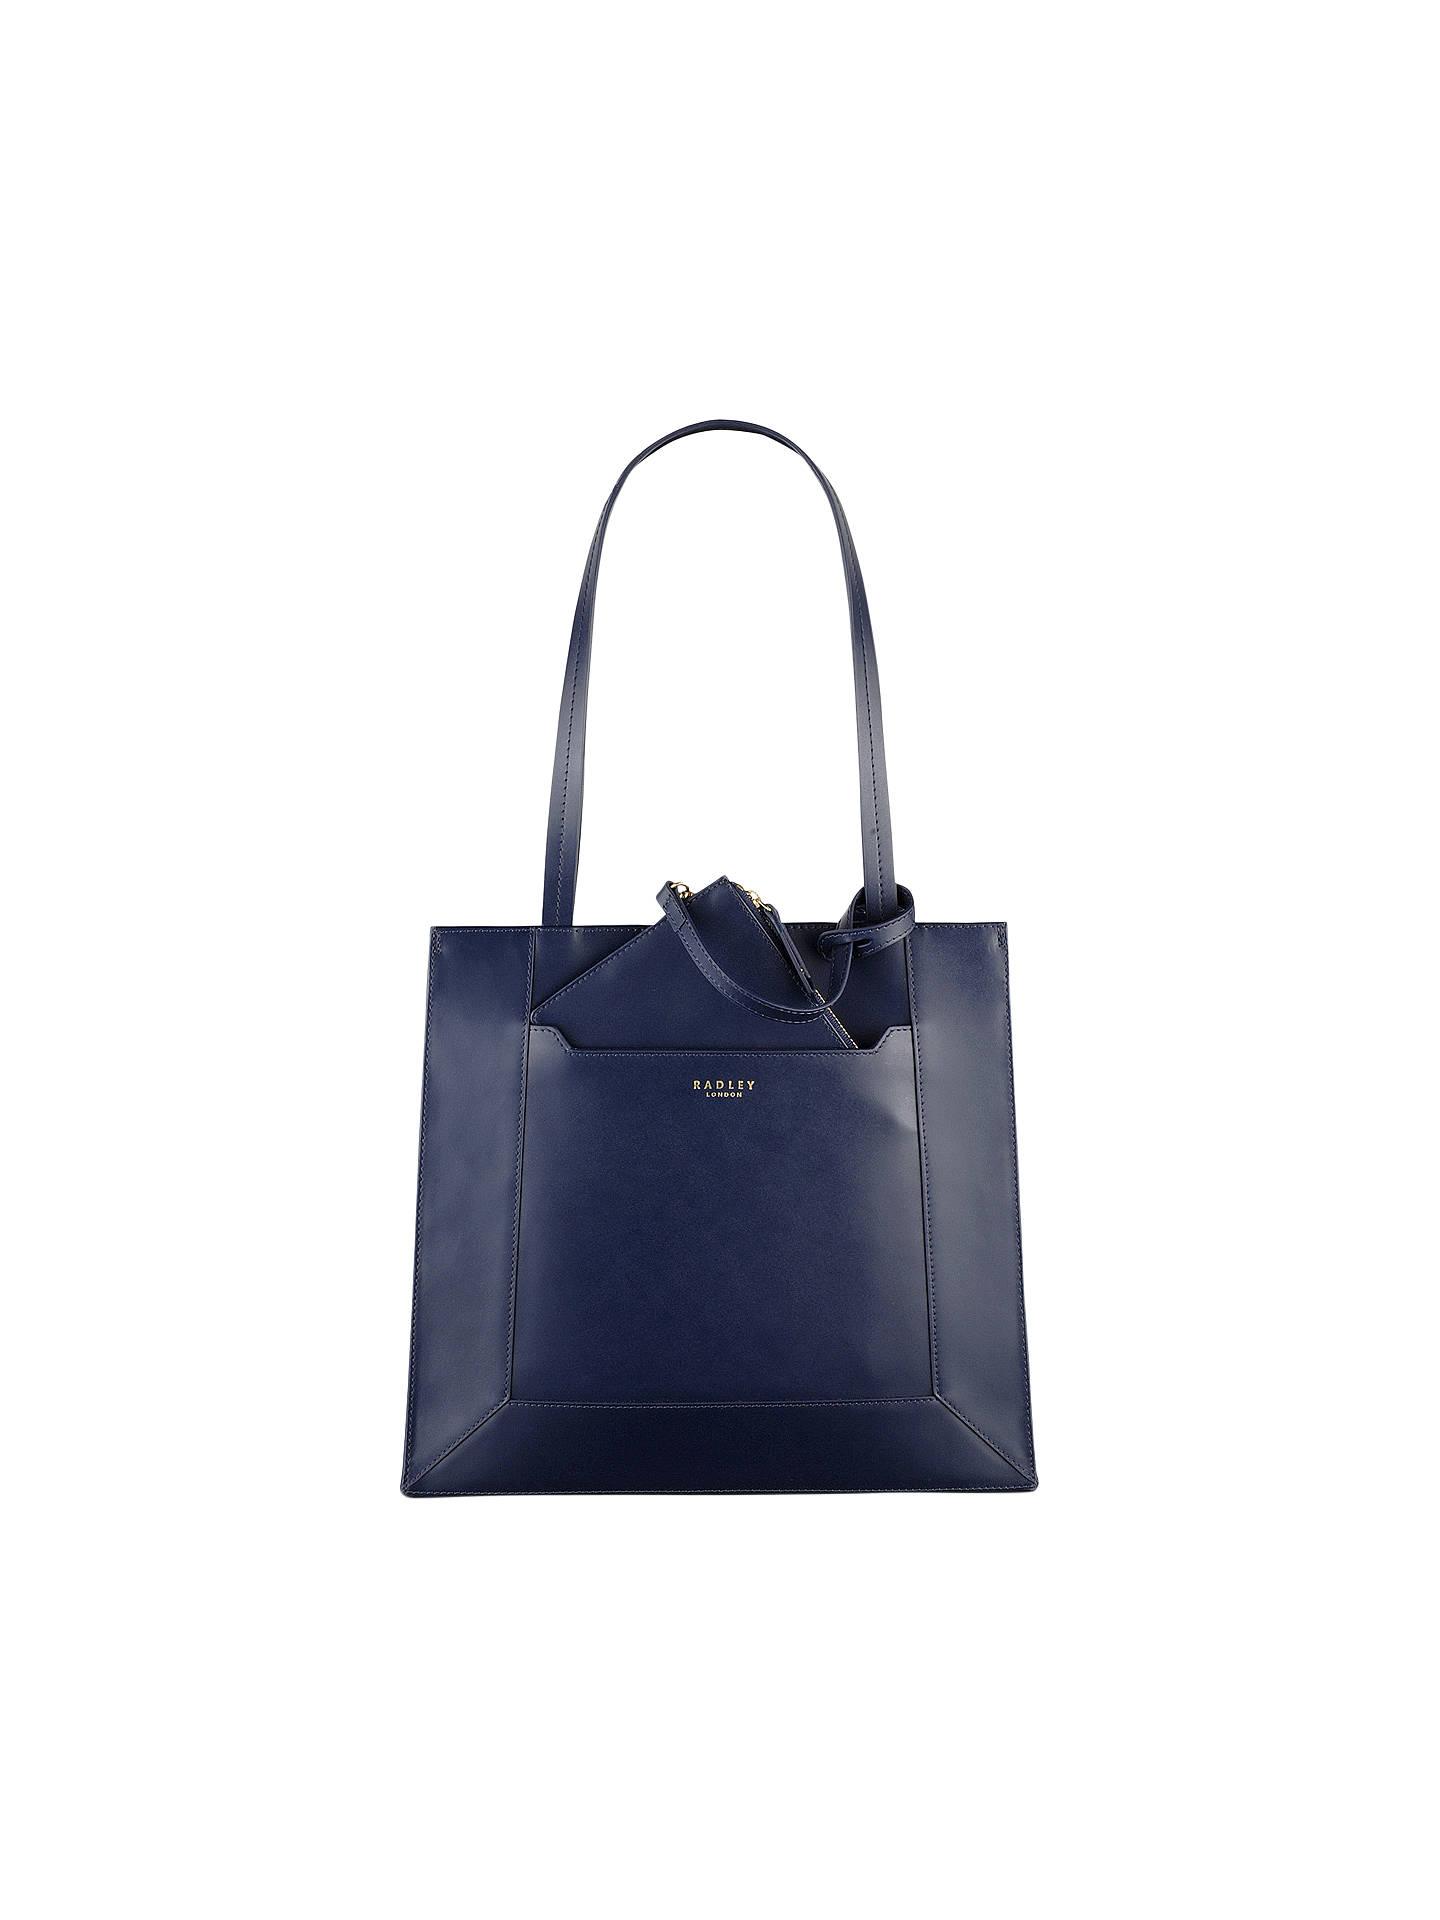 Radley Hardwick Large Leather Tote Bag at John Lewis   Partners